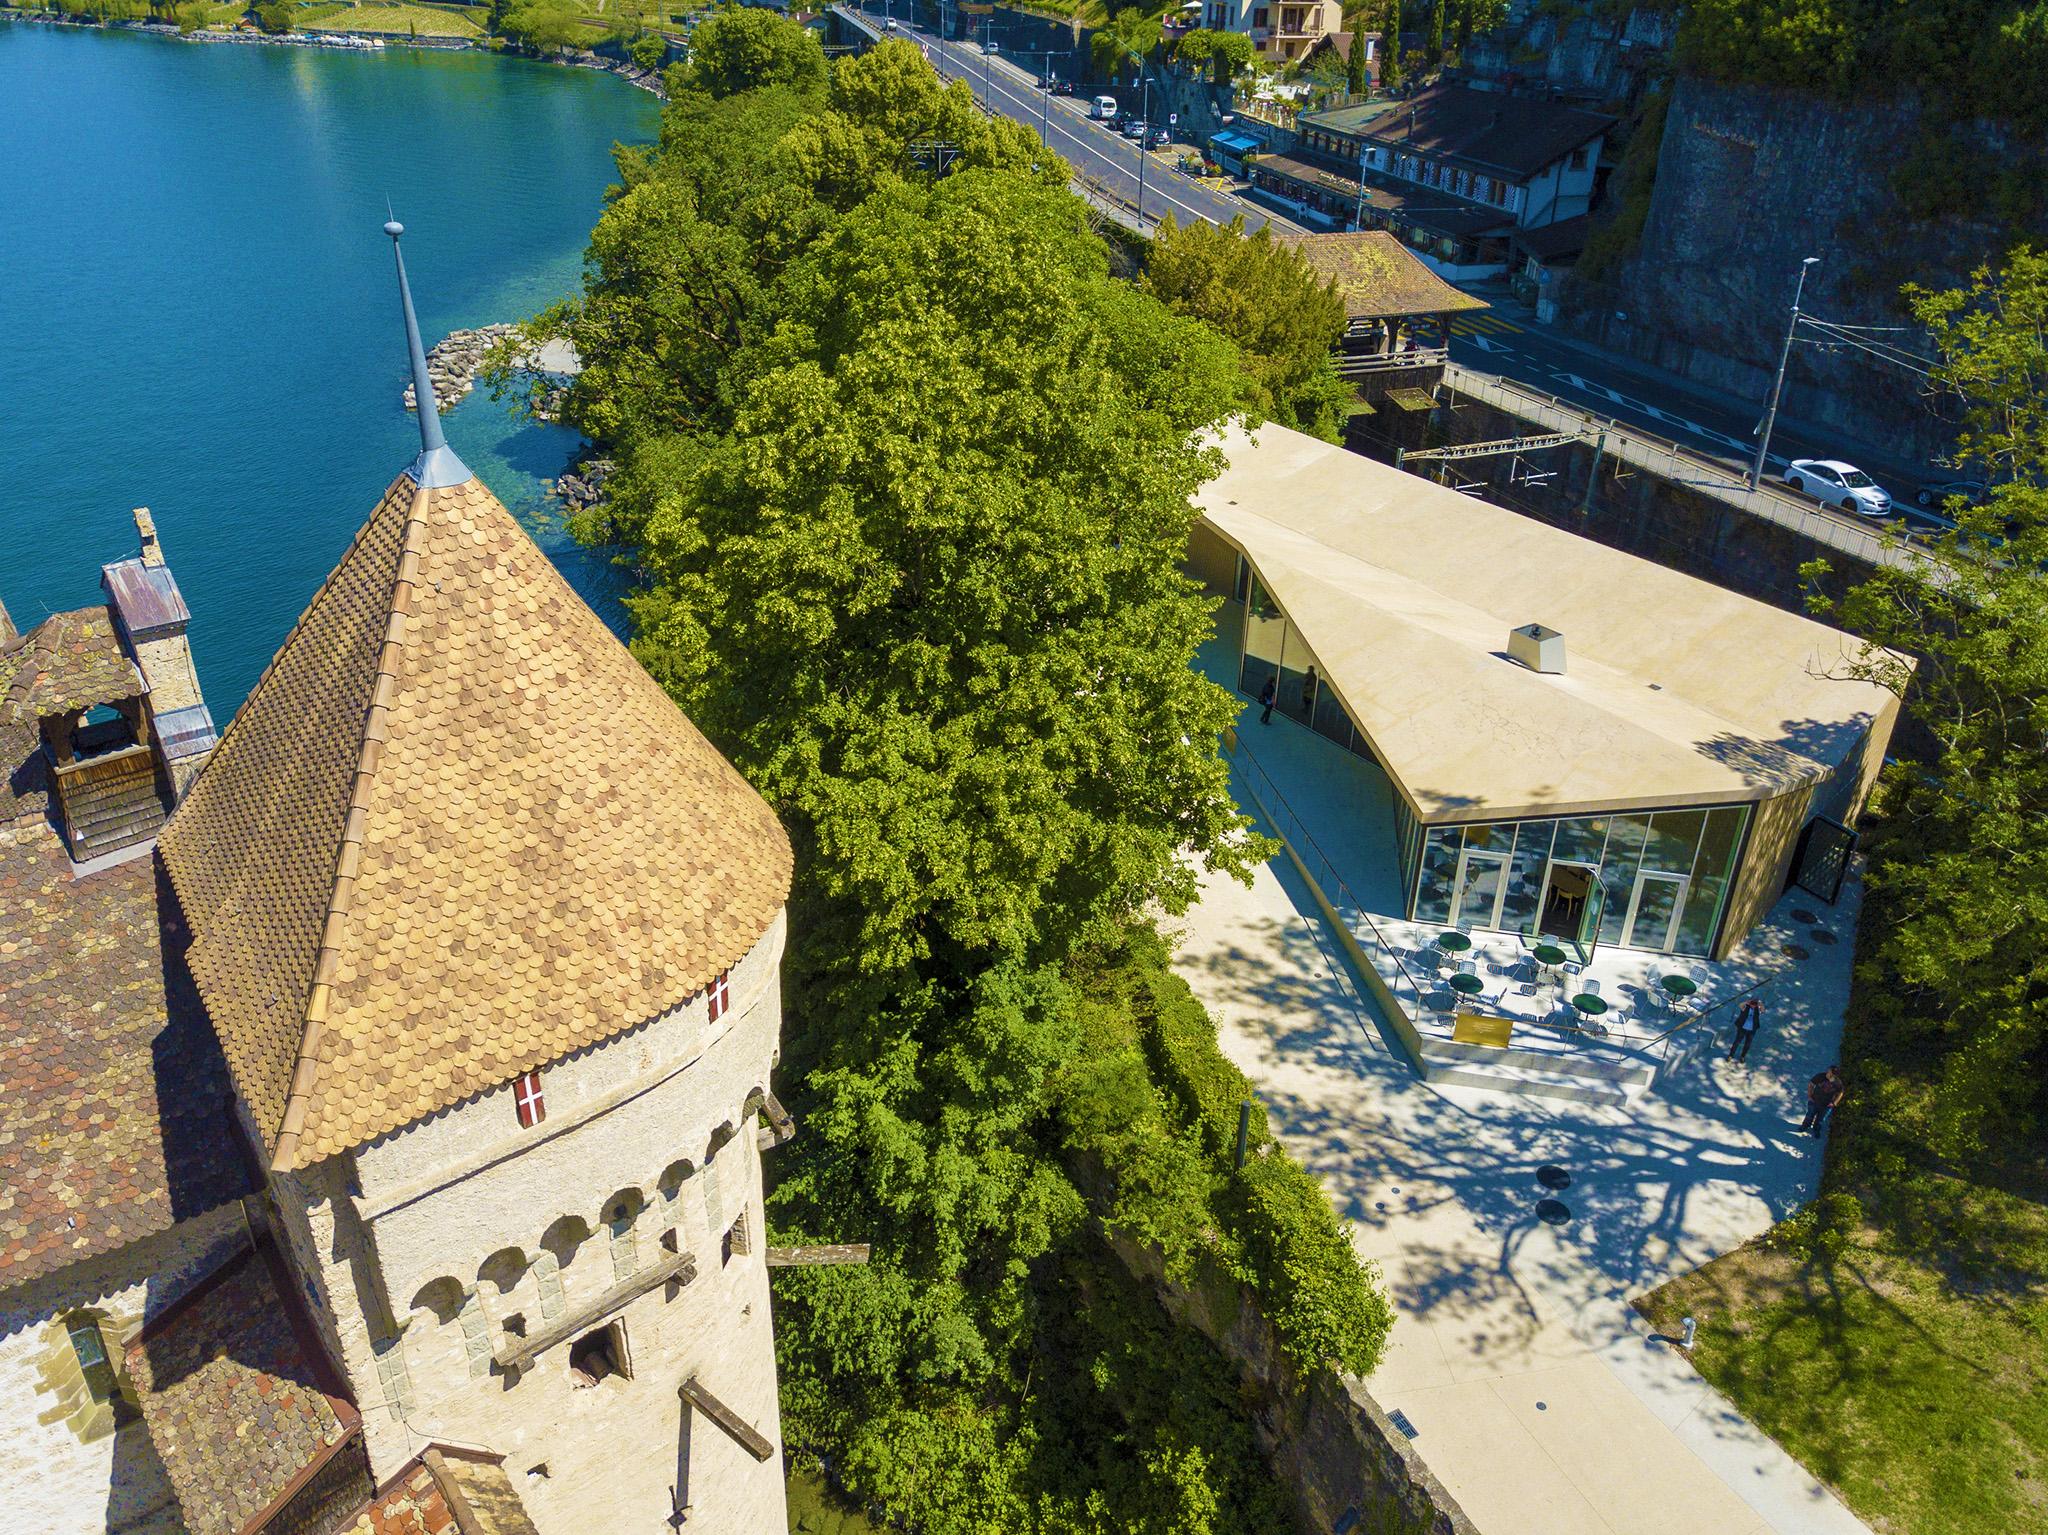 kt_2020_300_Keytours_excursions_Swisstours_chateau chillon31_2048_10